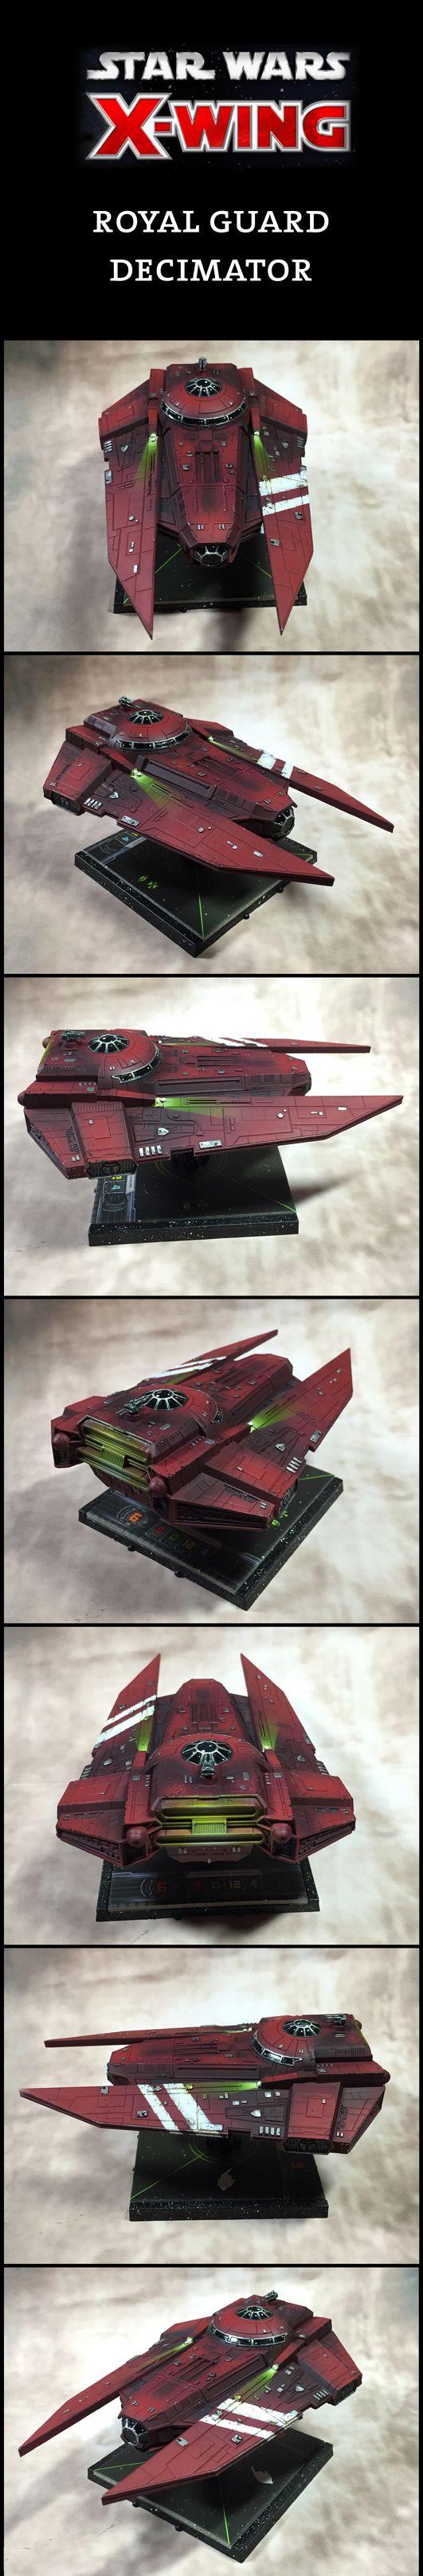 X-Wing Miniatures Royal Guard Decimator                                                                                                                                                                                 More